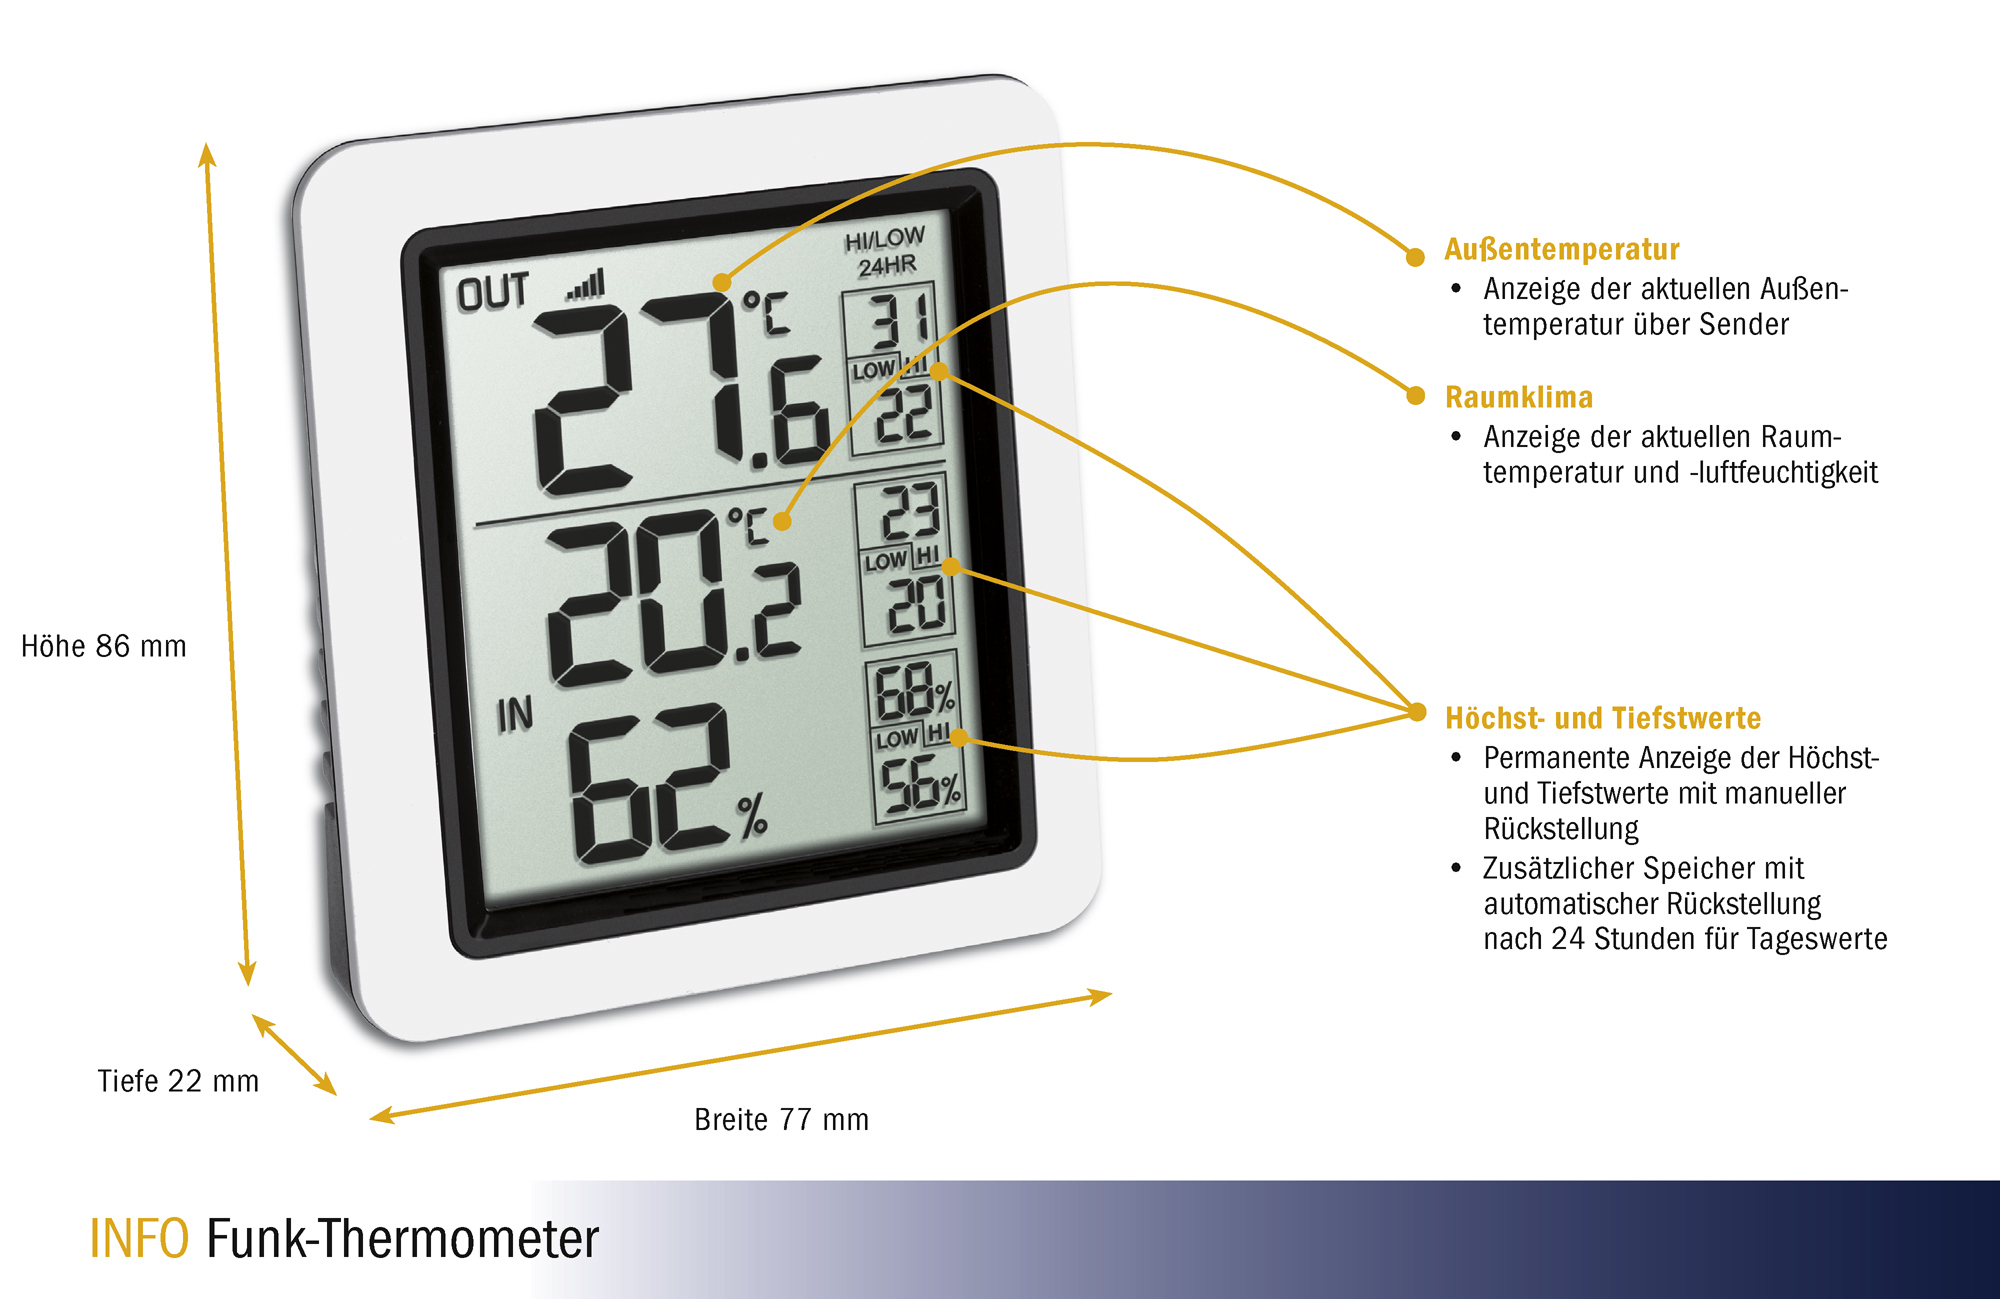 Info_Funk-Thermometer_303065_Bemassung.jpg